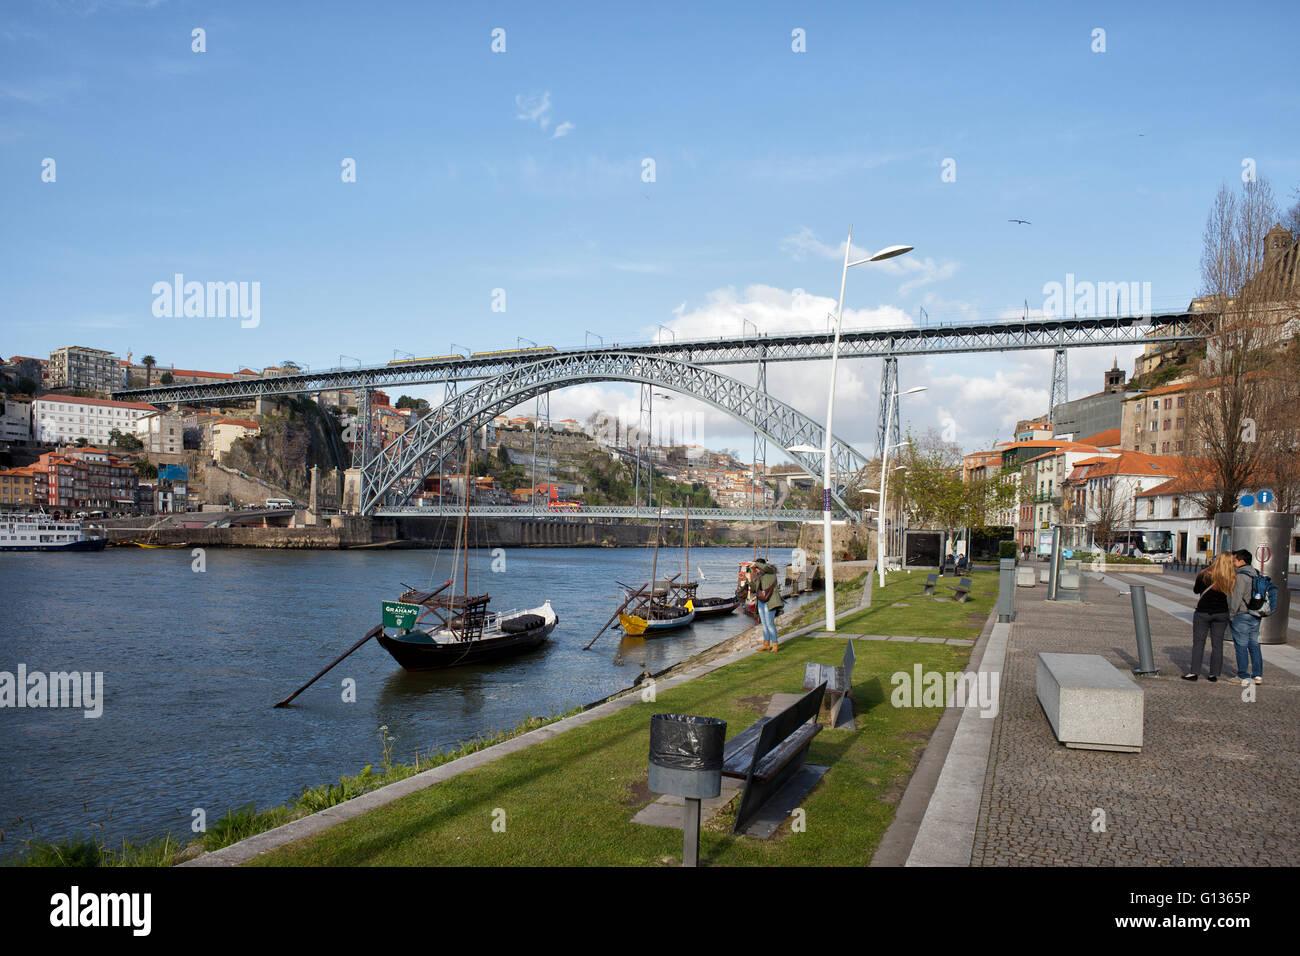 Portugal, city of Porto and Vila Nova de Gaia, Douro river, Dom Luis I Bridge - Stock Image